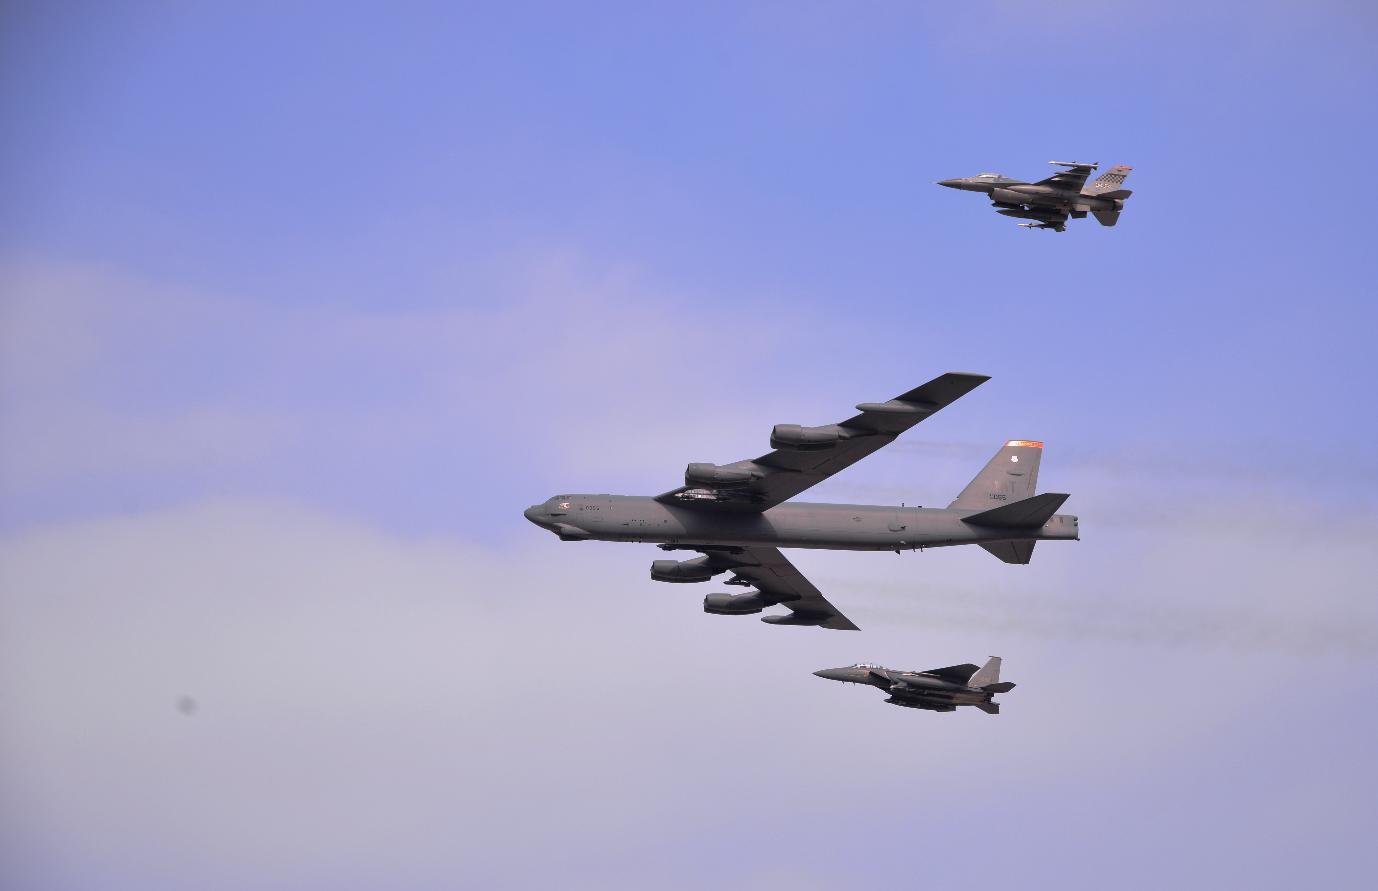 U.S., South Korea launch Vigilant Ace